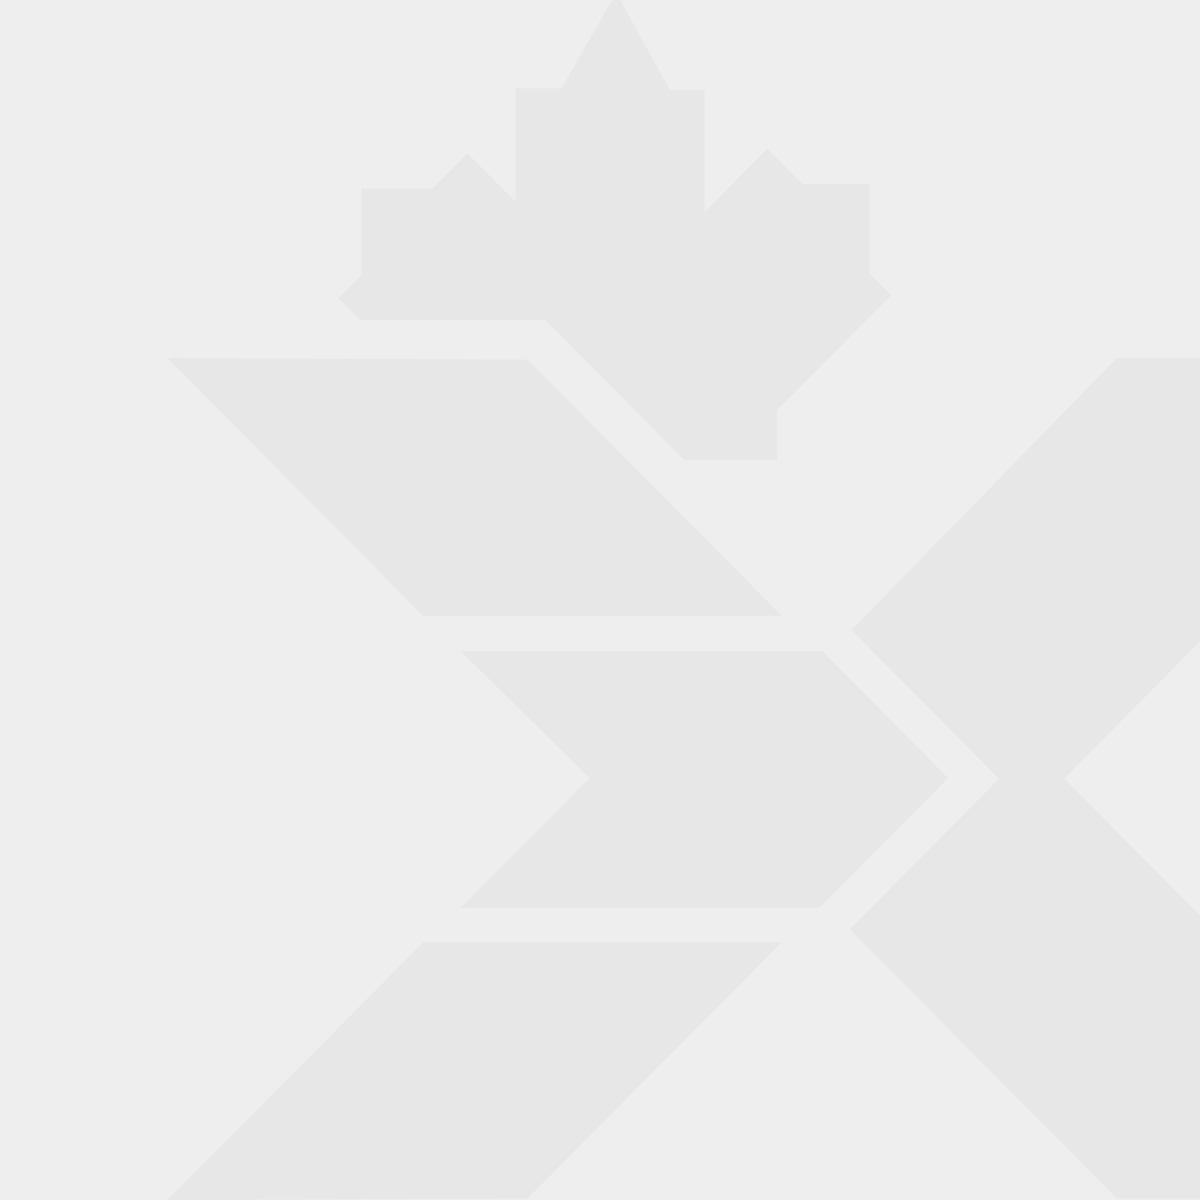 Royal Canadian Navy Men's Cotton T-Shirt